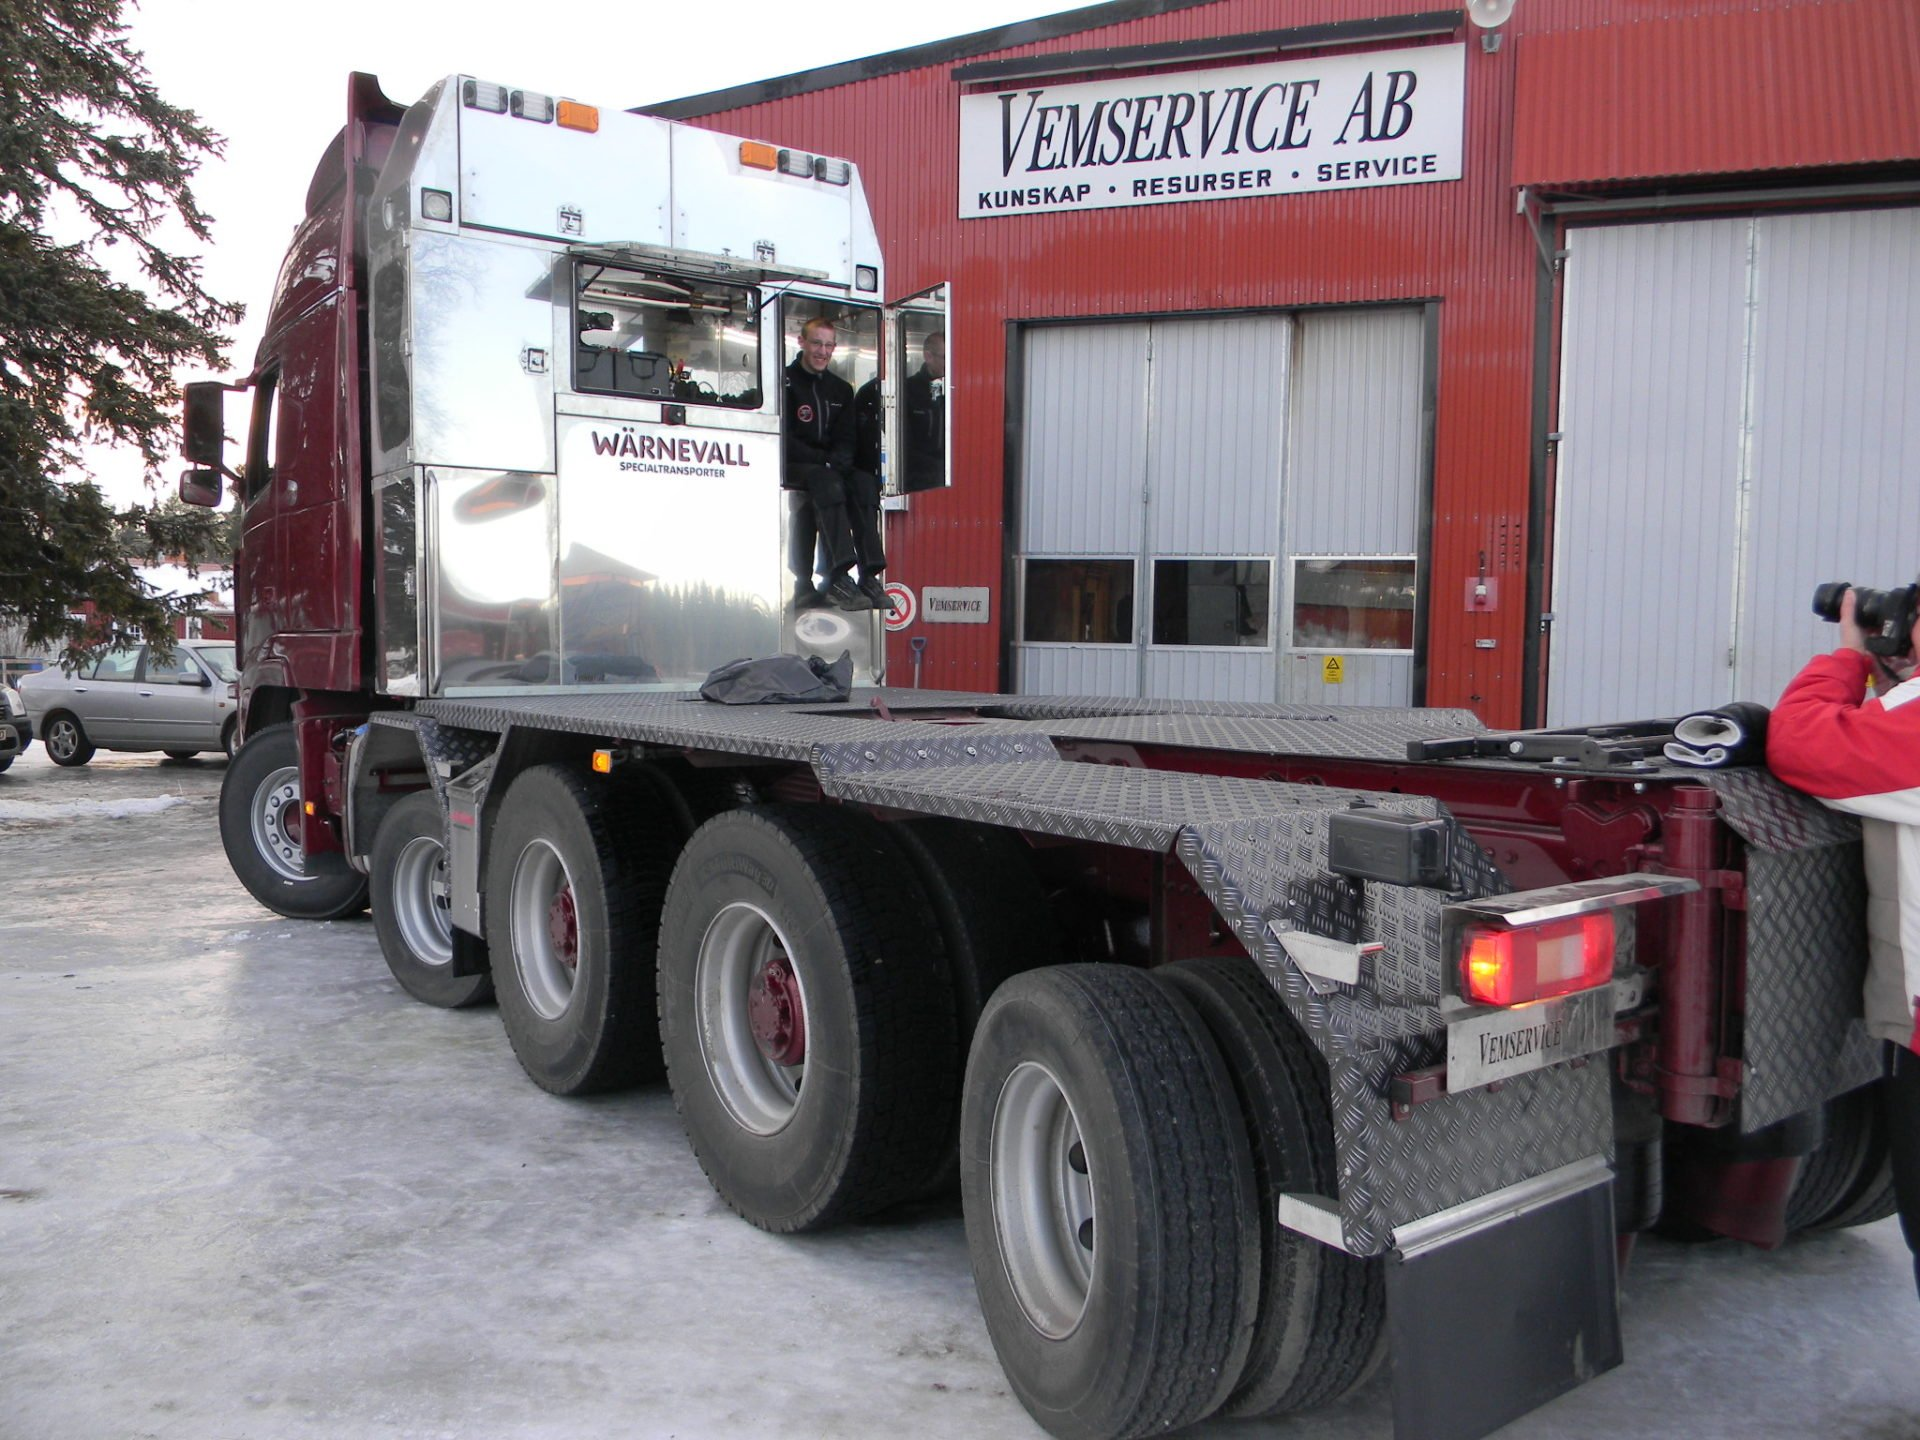 1350405 Wärnevall (19)